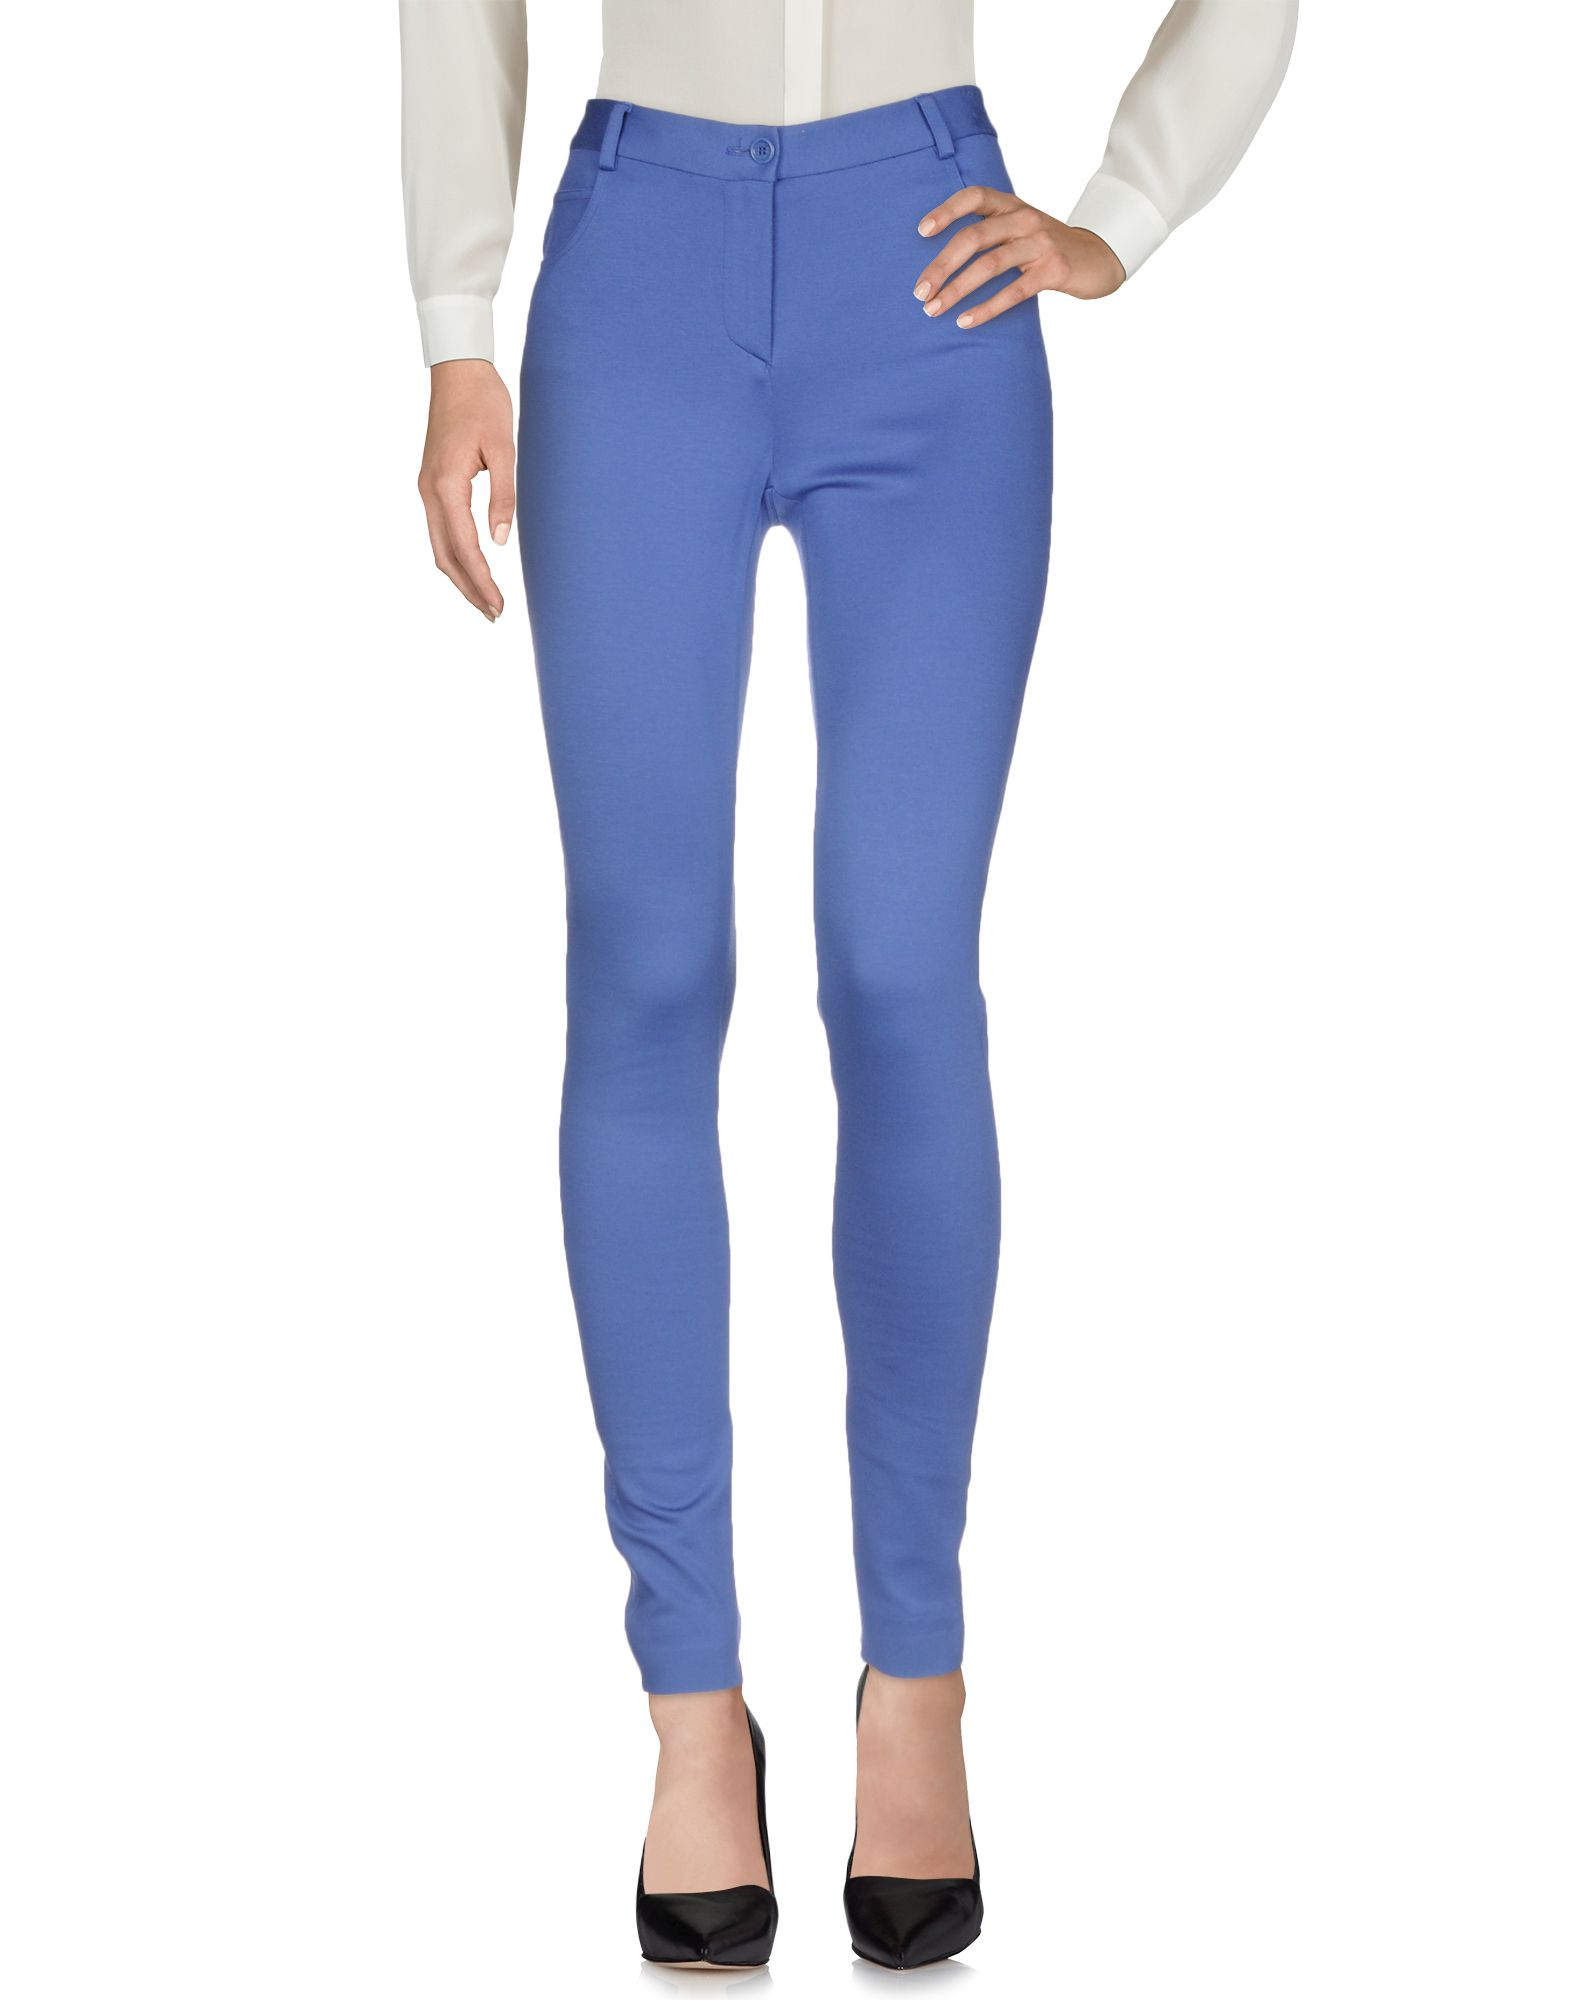 Pantalone Moschino Donna - Acquista online su FUYAwVZdf